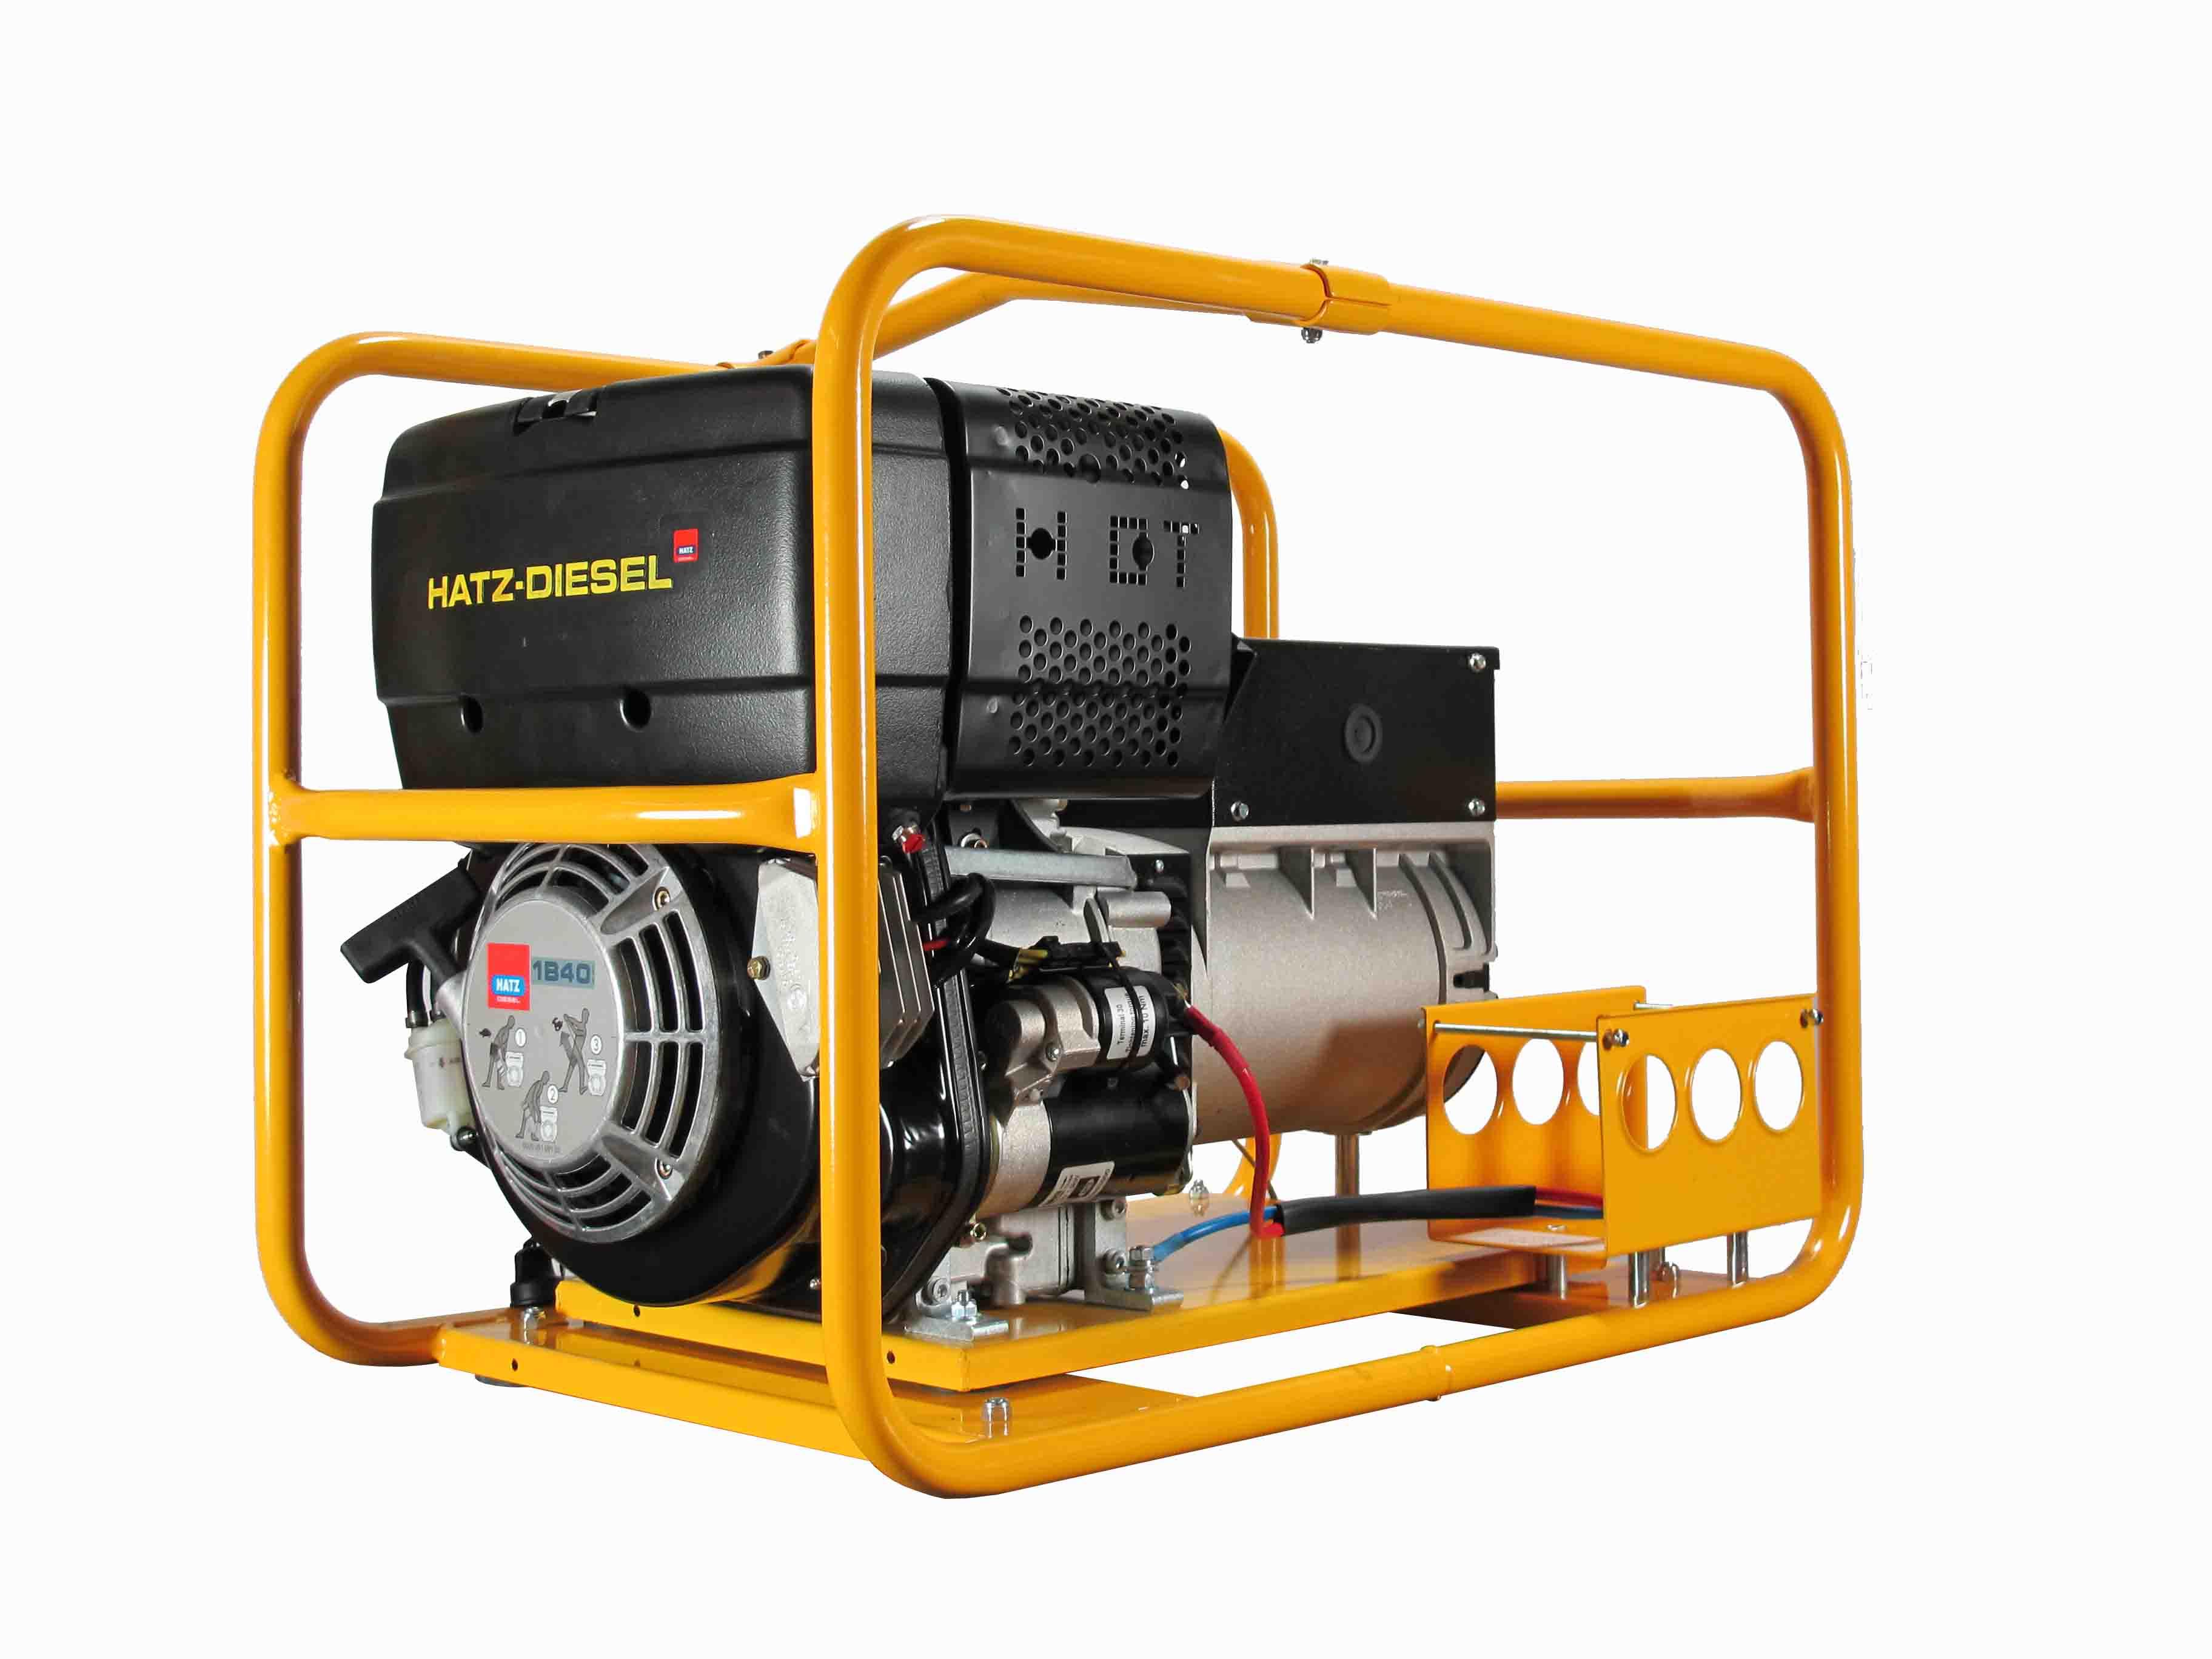 phzd070e3 u2013 5500w 3 phase generator